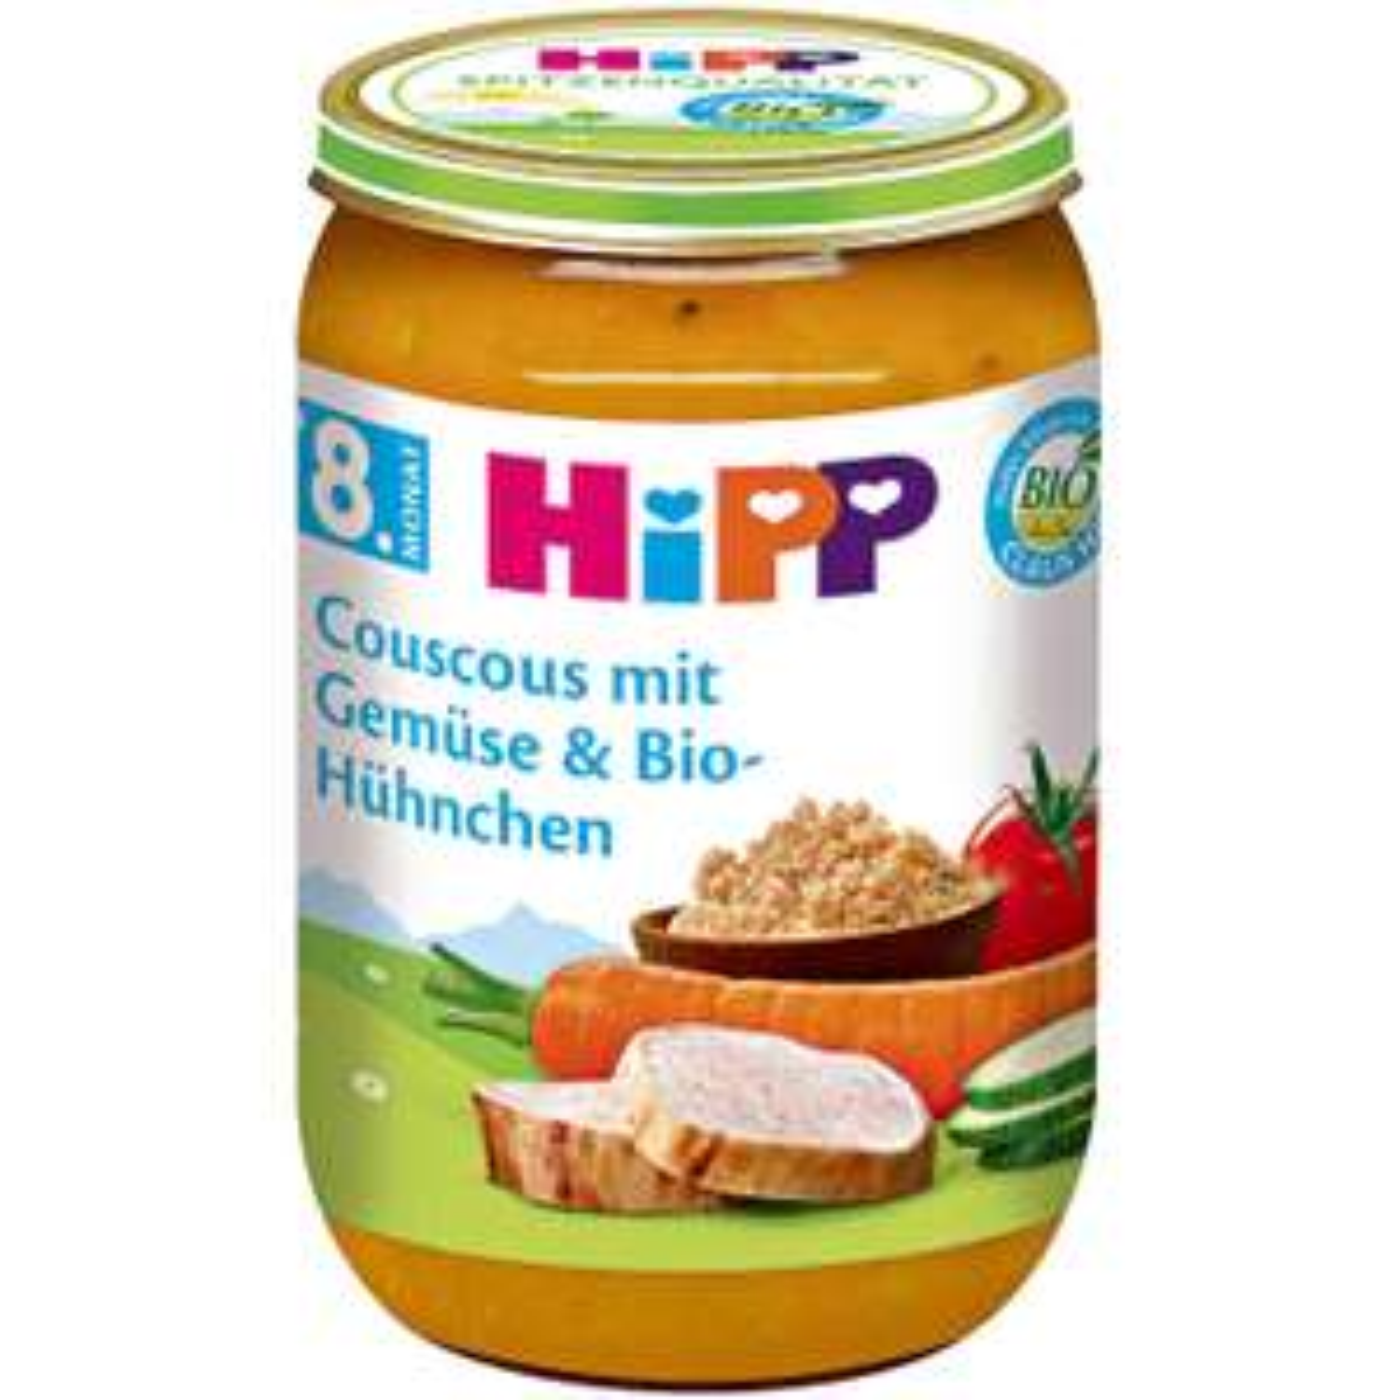 Bio Menü Couscous mit Gemüse & Bio-Hühnchen HiPP Rossmann